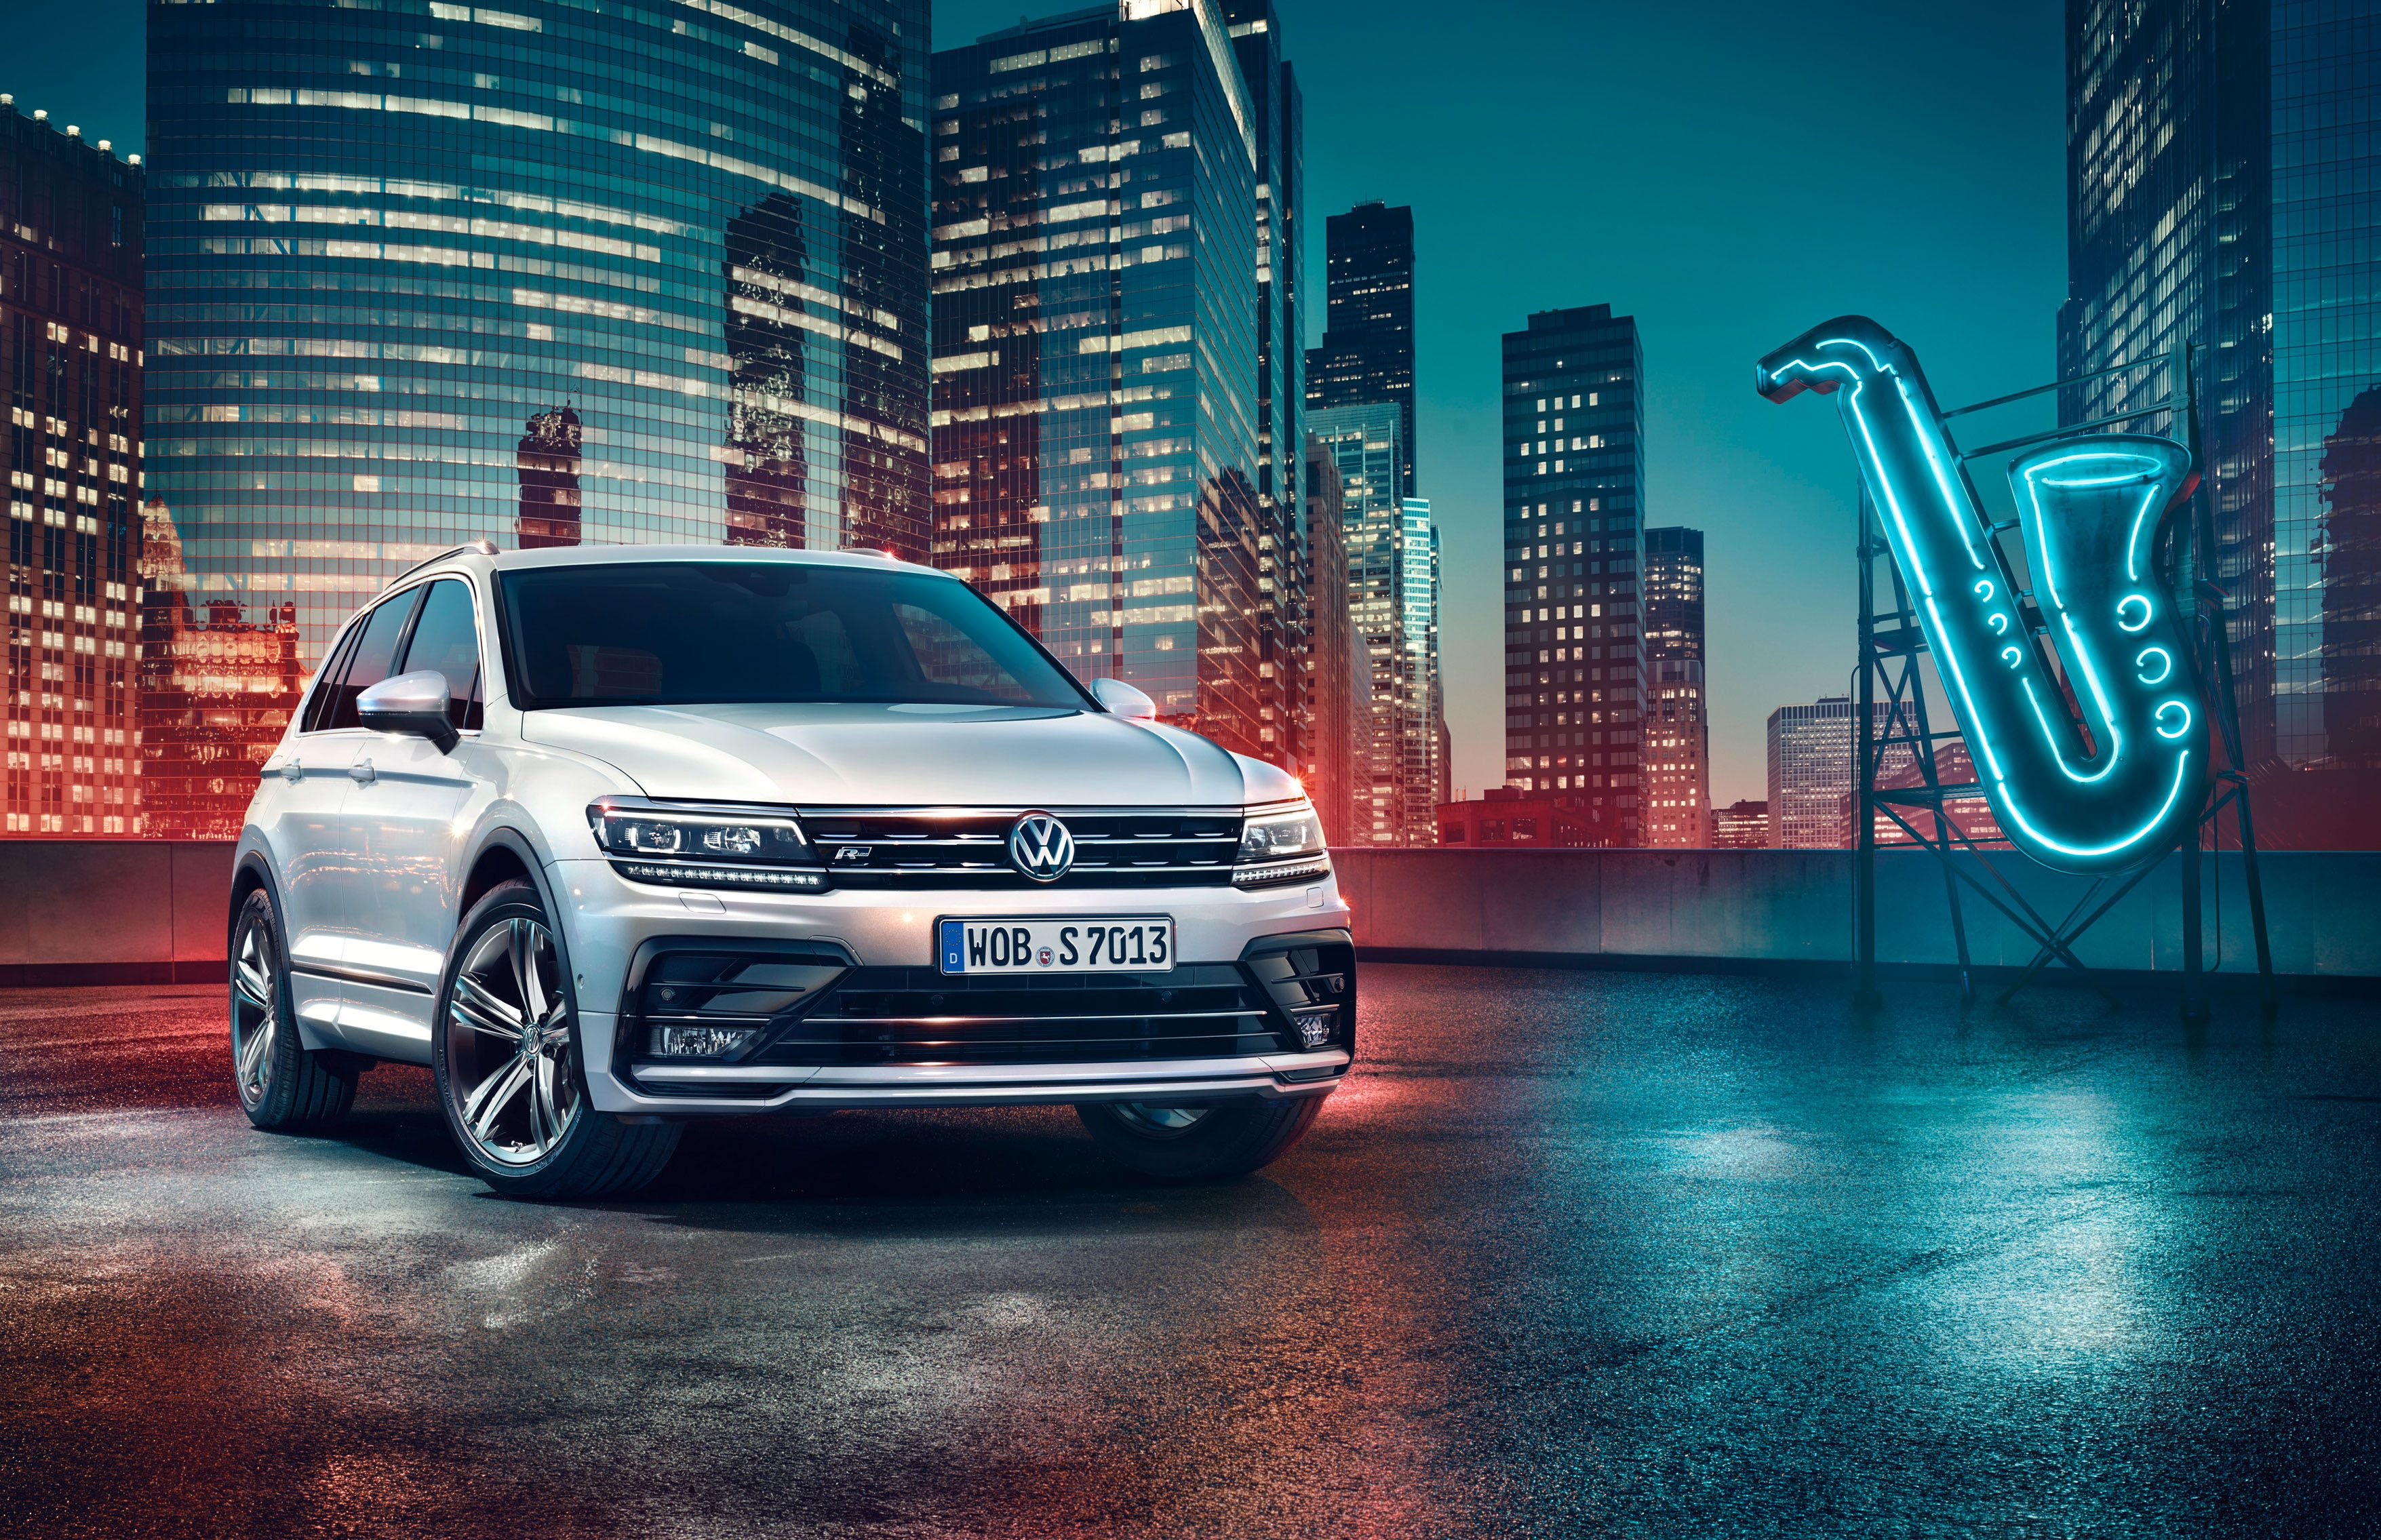 Vw Sondermodelle Sound 2017 On Behance Auto Carros